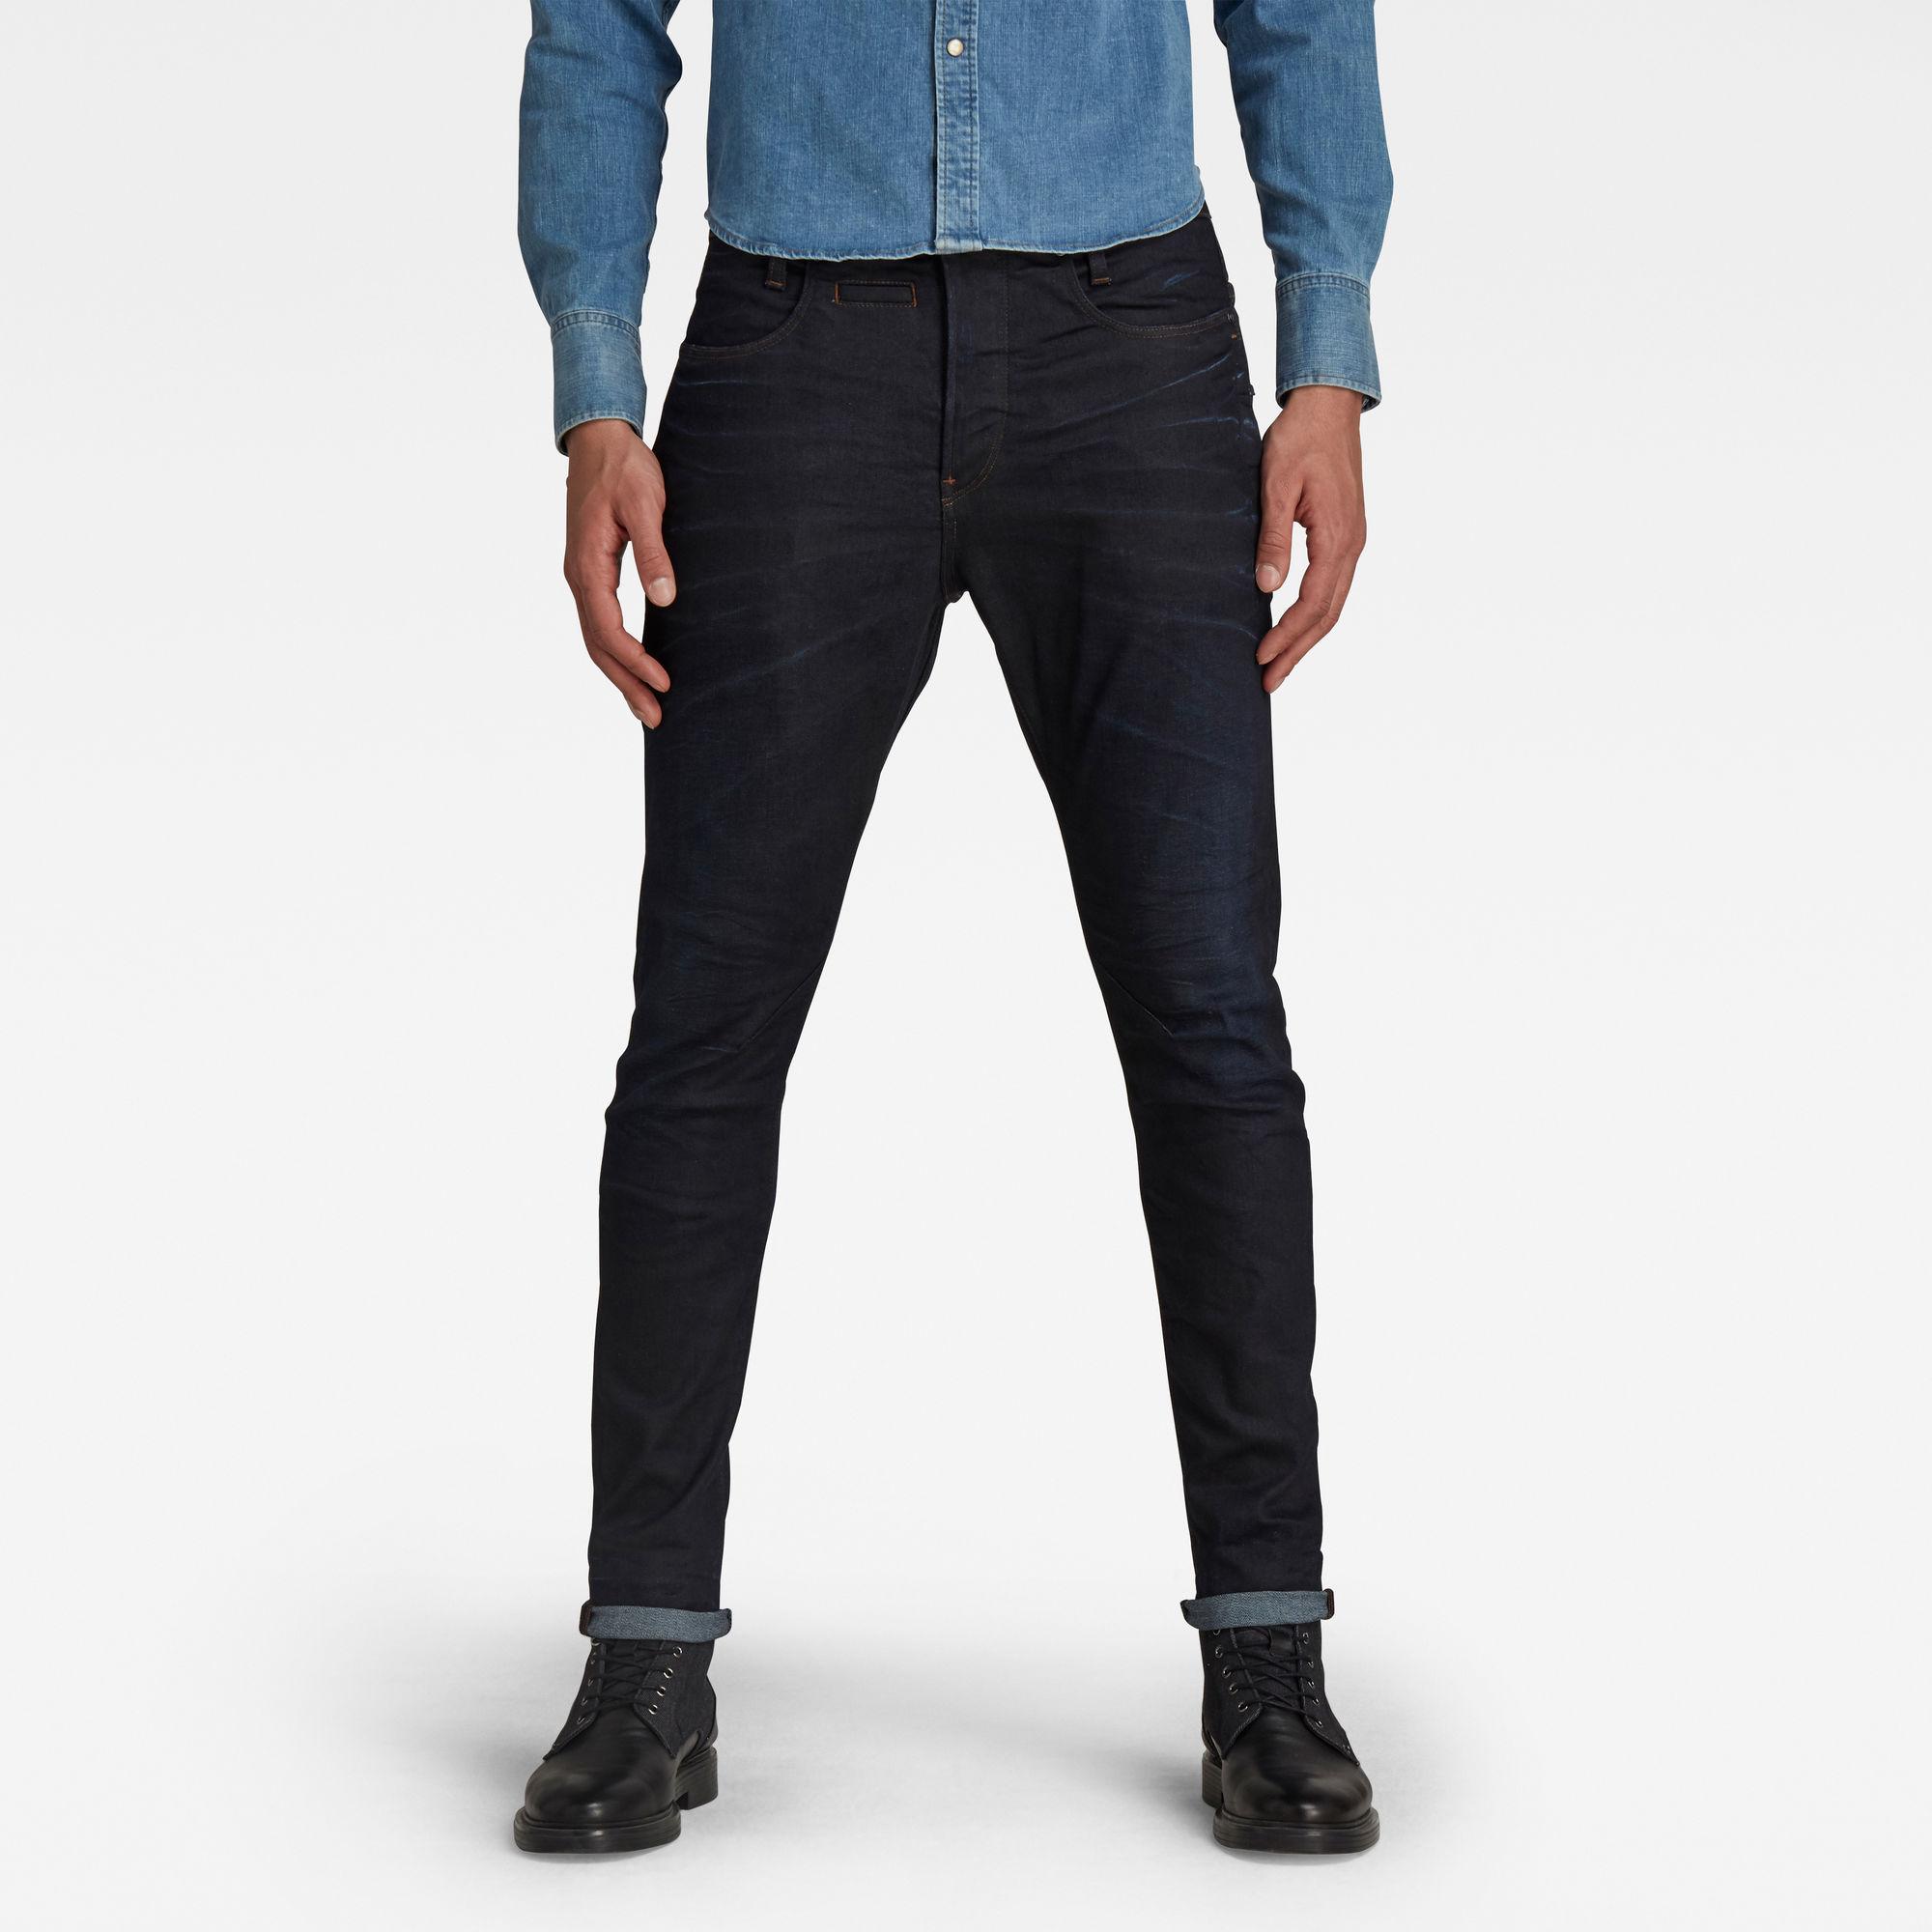 G-Star RAW Heren D-Staq 3D Slim Jeans Donkerblauw